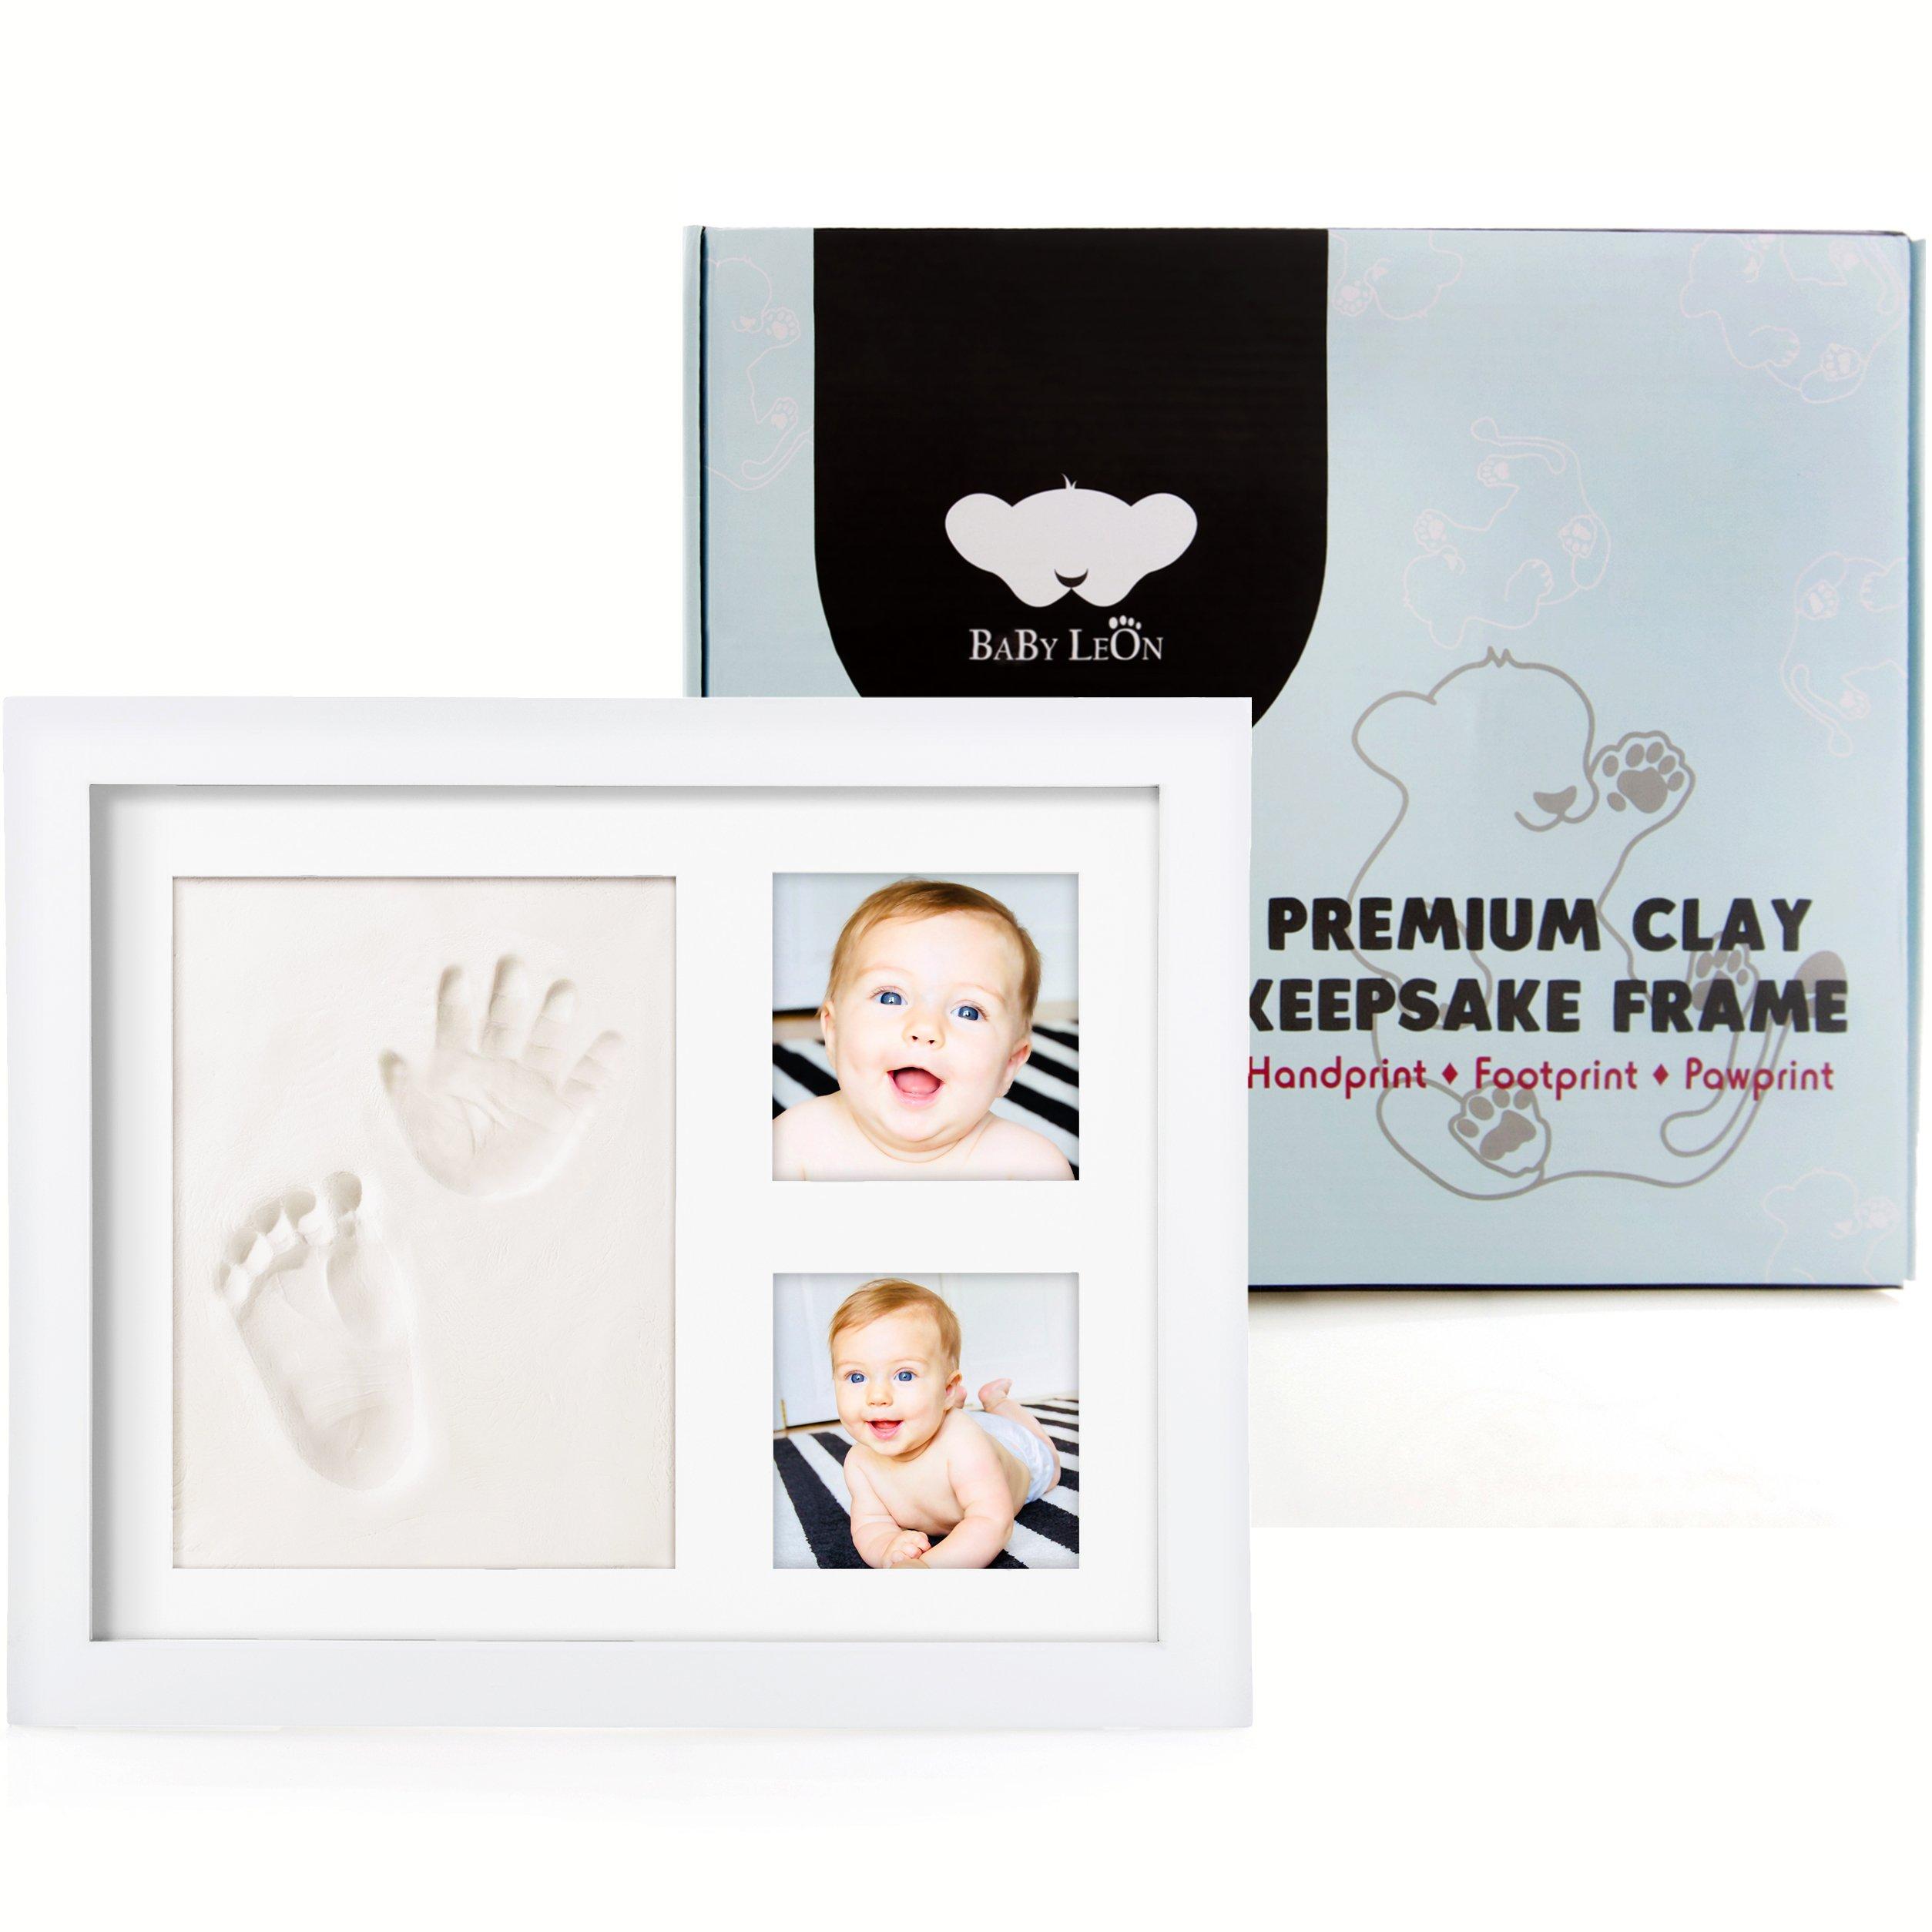 Baby Leon Premium Footprint Kit | Best Baby Shower Gift for Newborn Girls & Boys | New Mom Gift Registry | Baby Room Picture Frame Decor | Handprint & Pet Paw Print Keepsake | Safe Air Dry Clay